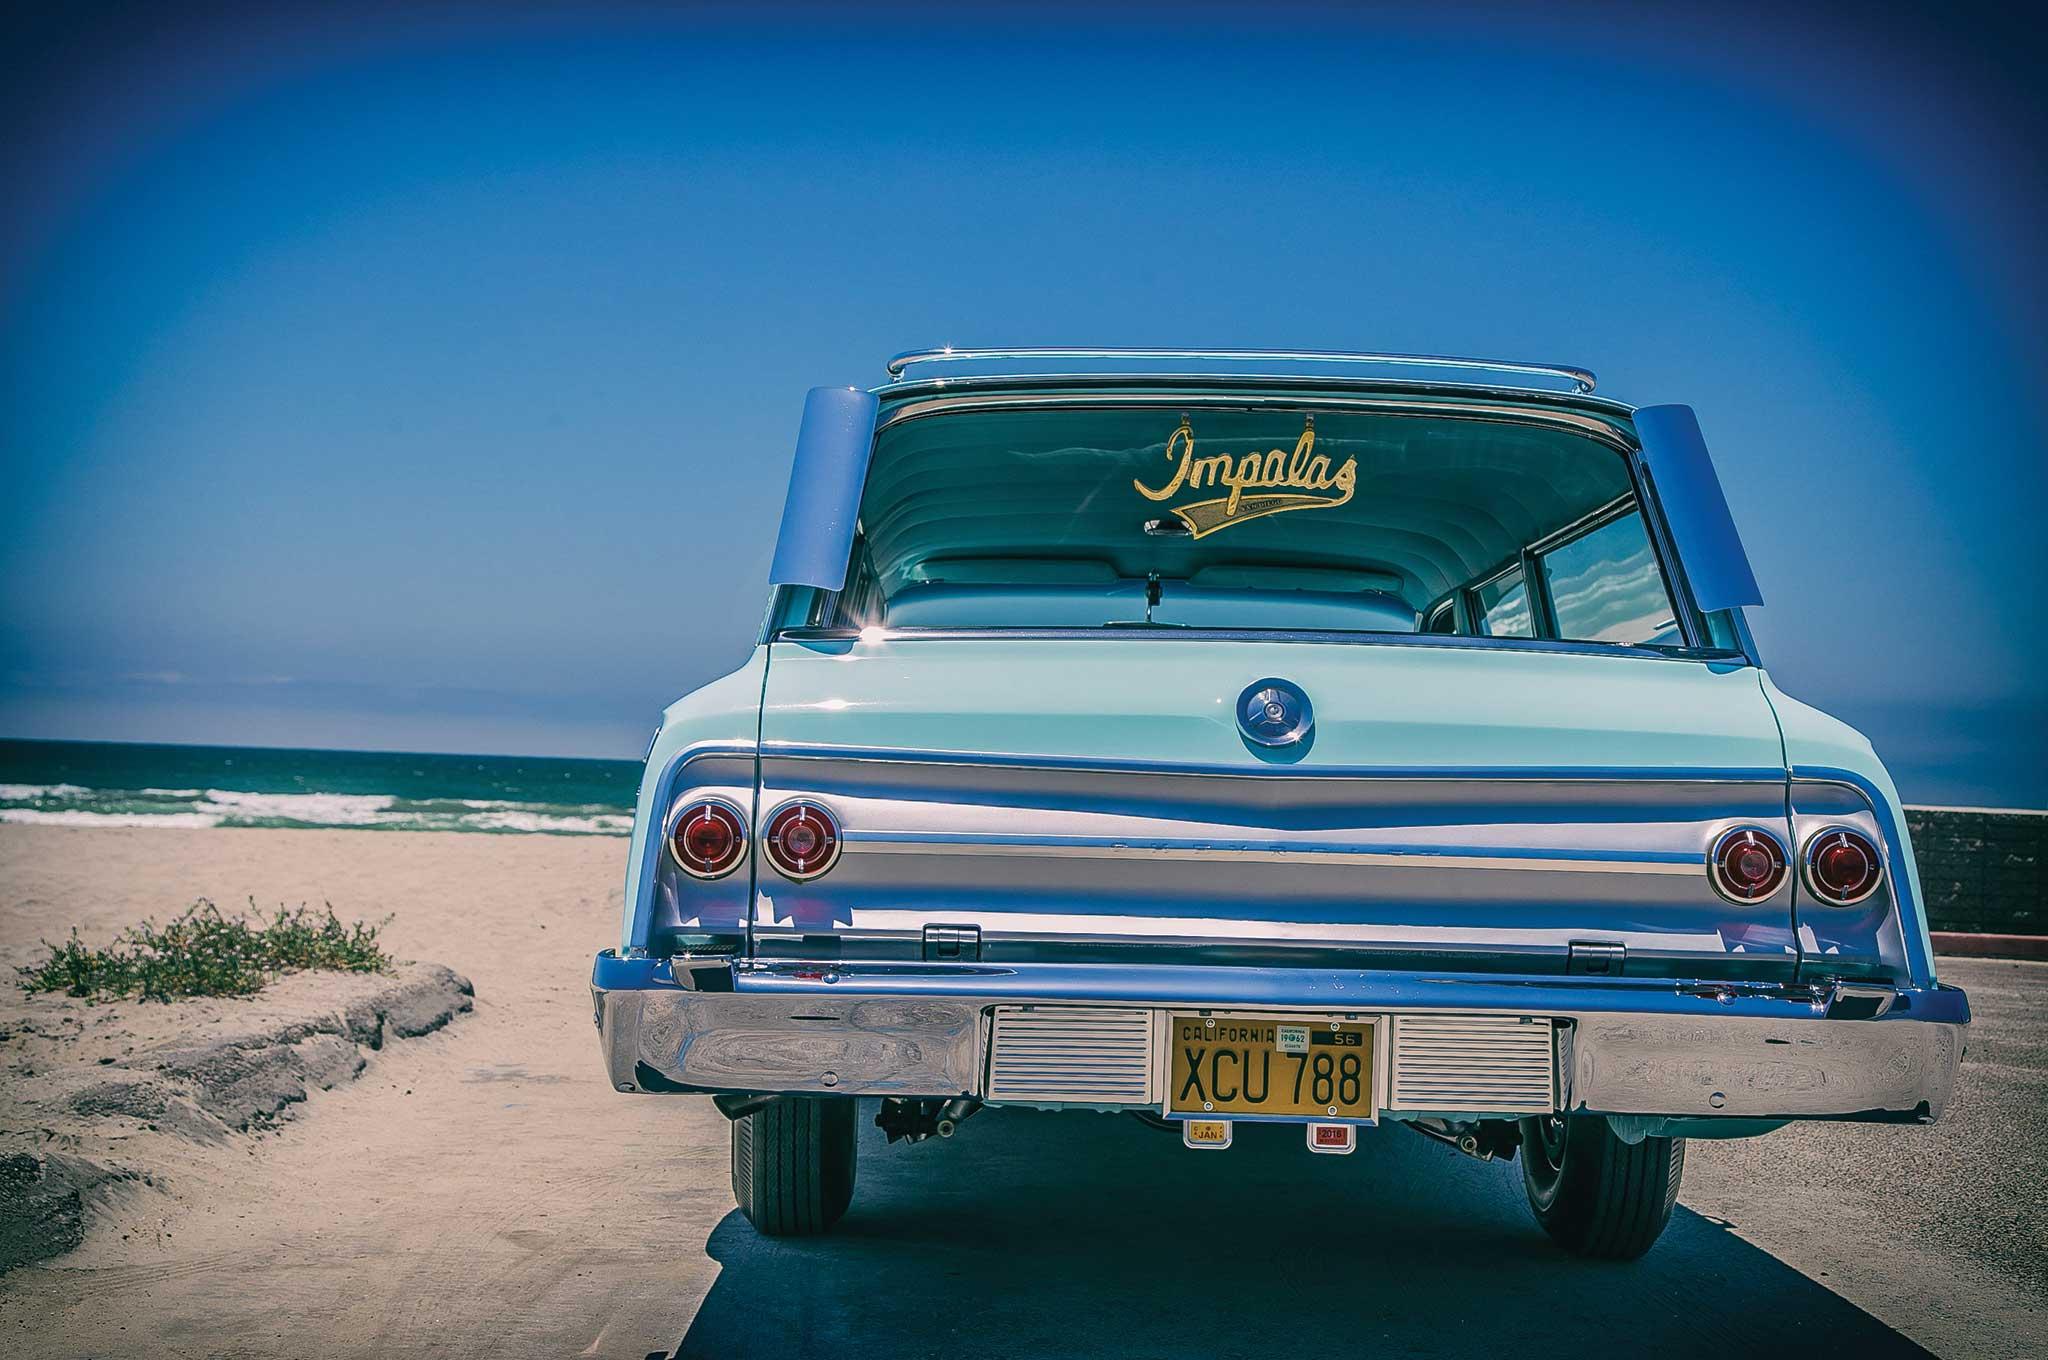 1962 Chevrolet Impala Wagon - Just a Wagon - Lowrider